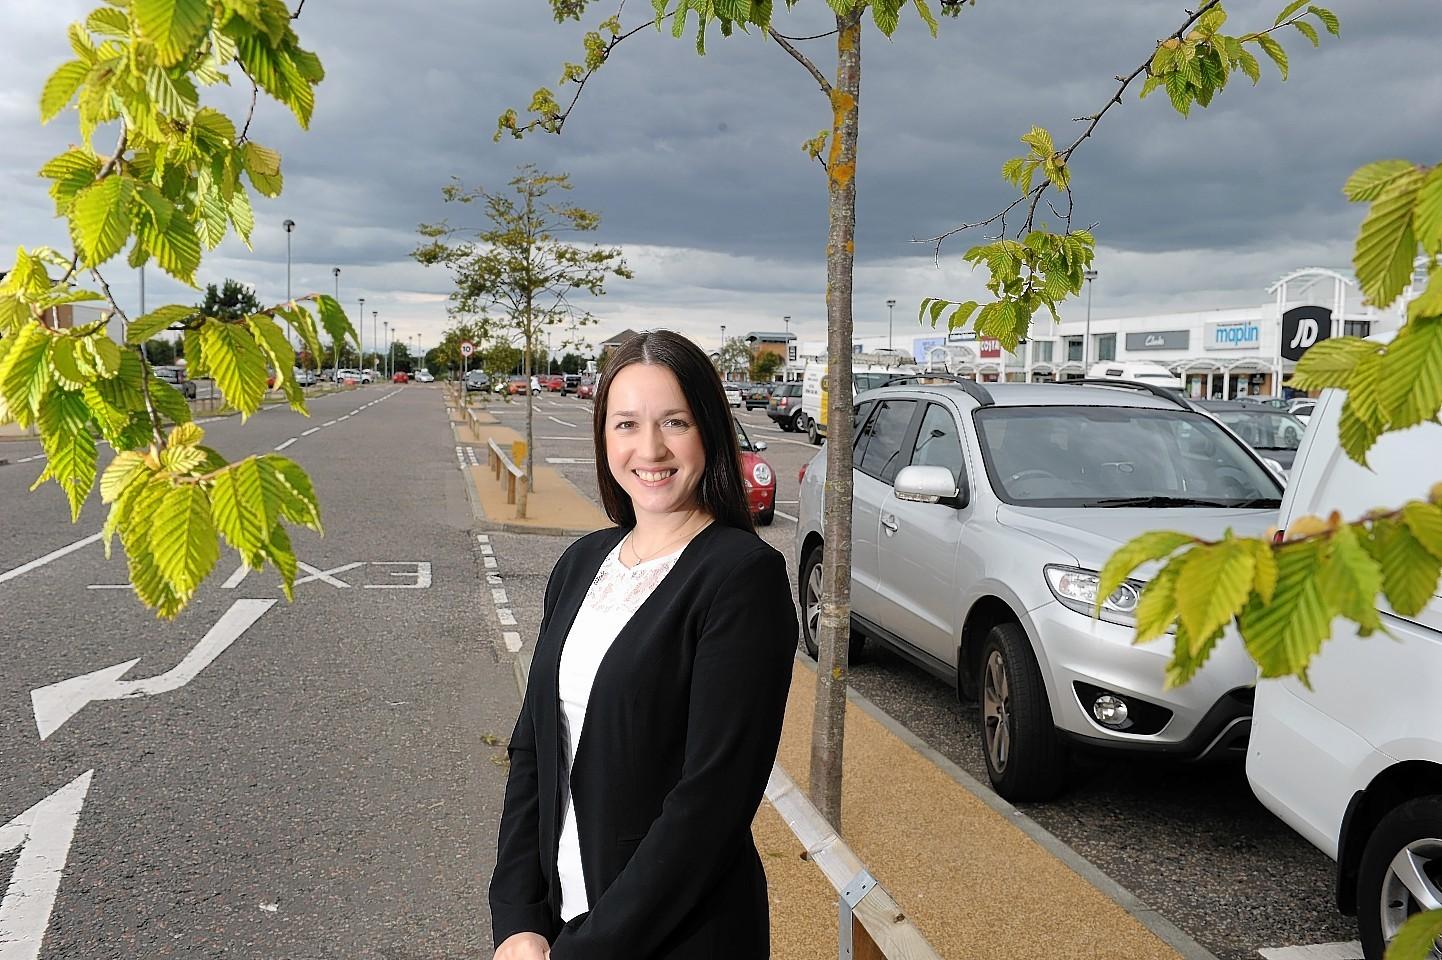 Kirsteen Gunn, manager of Inverness Shopping Park